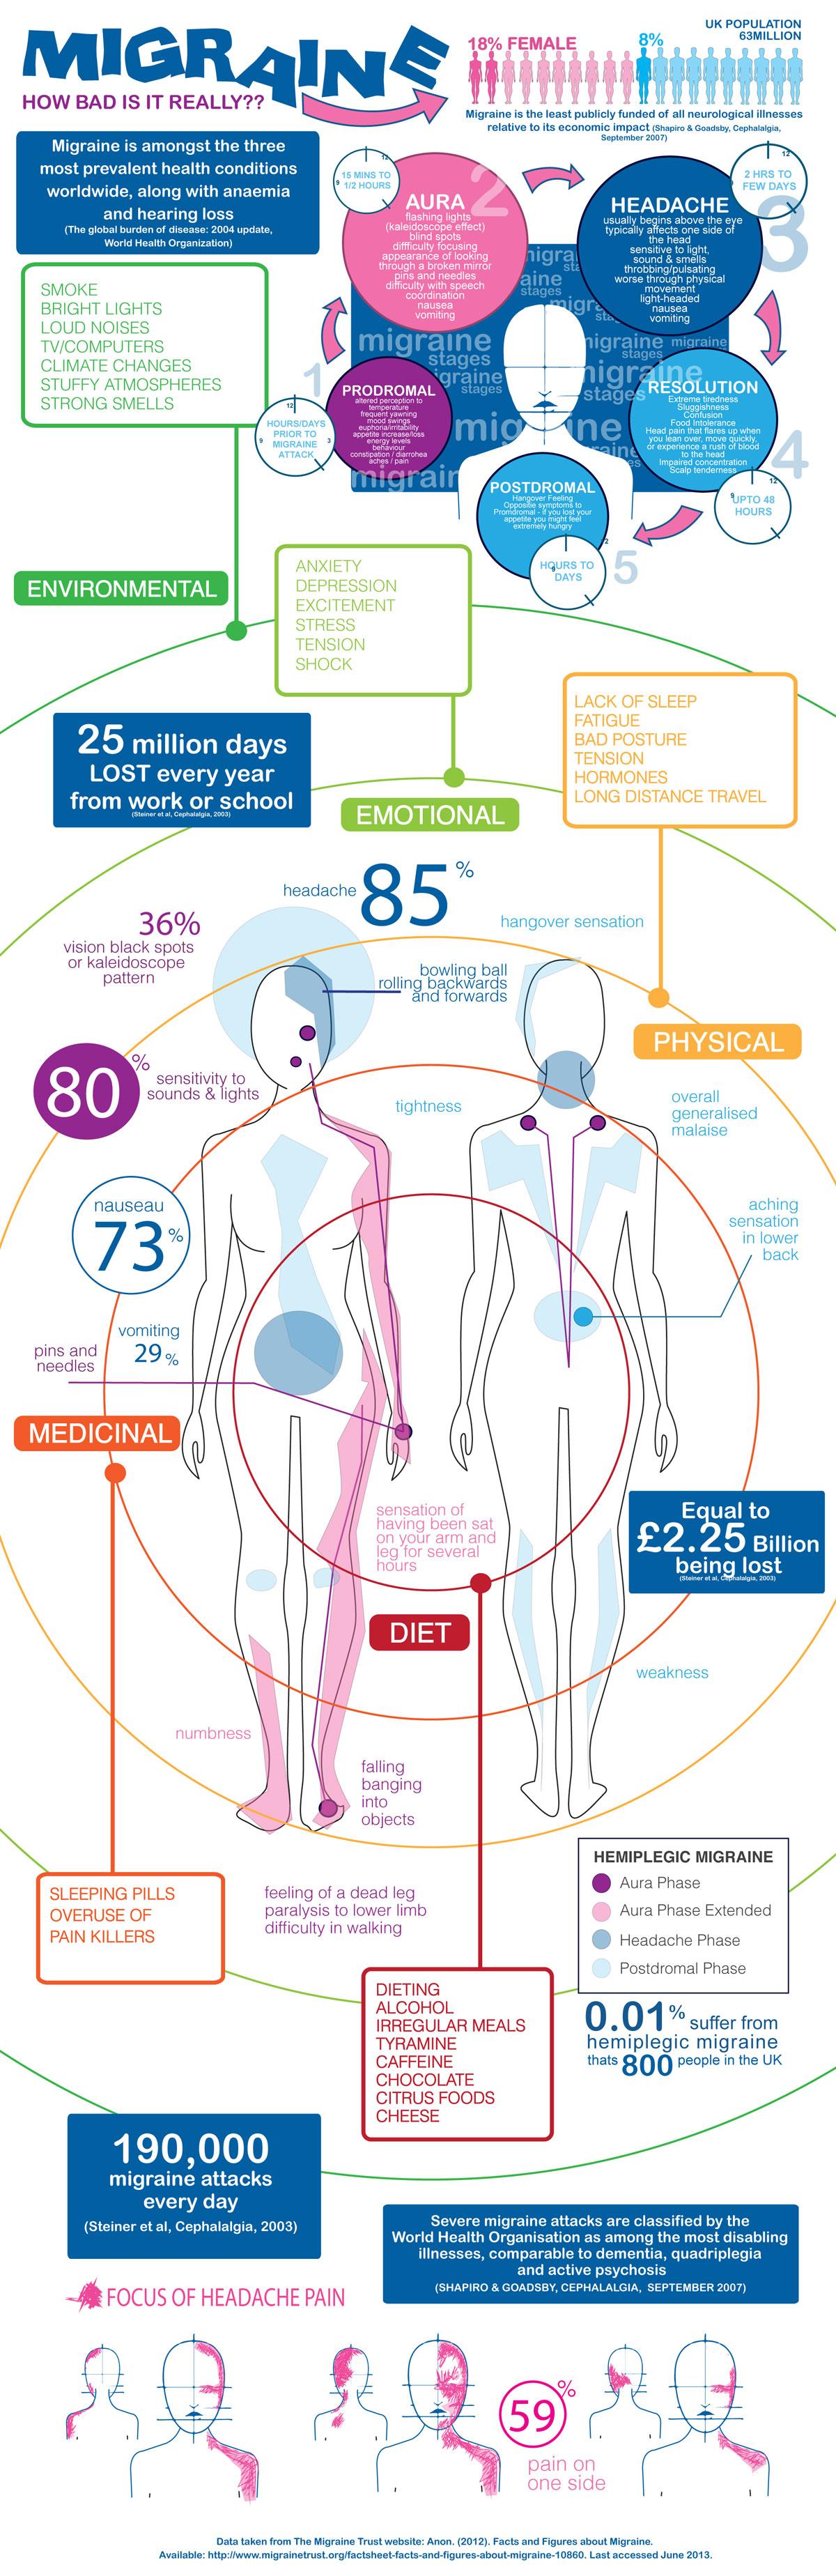 How to avoid migraines infographic